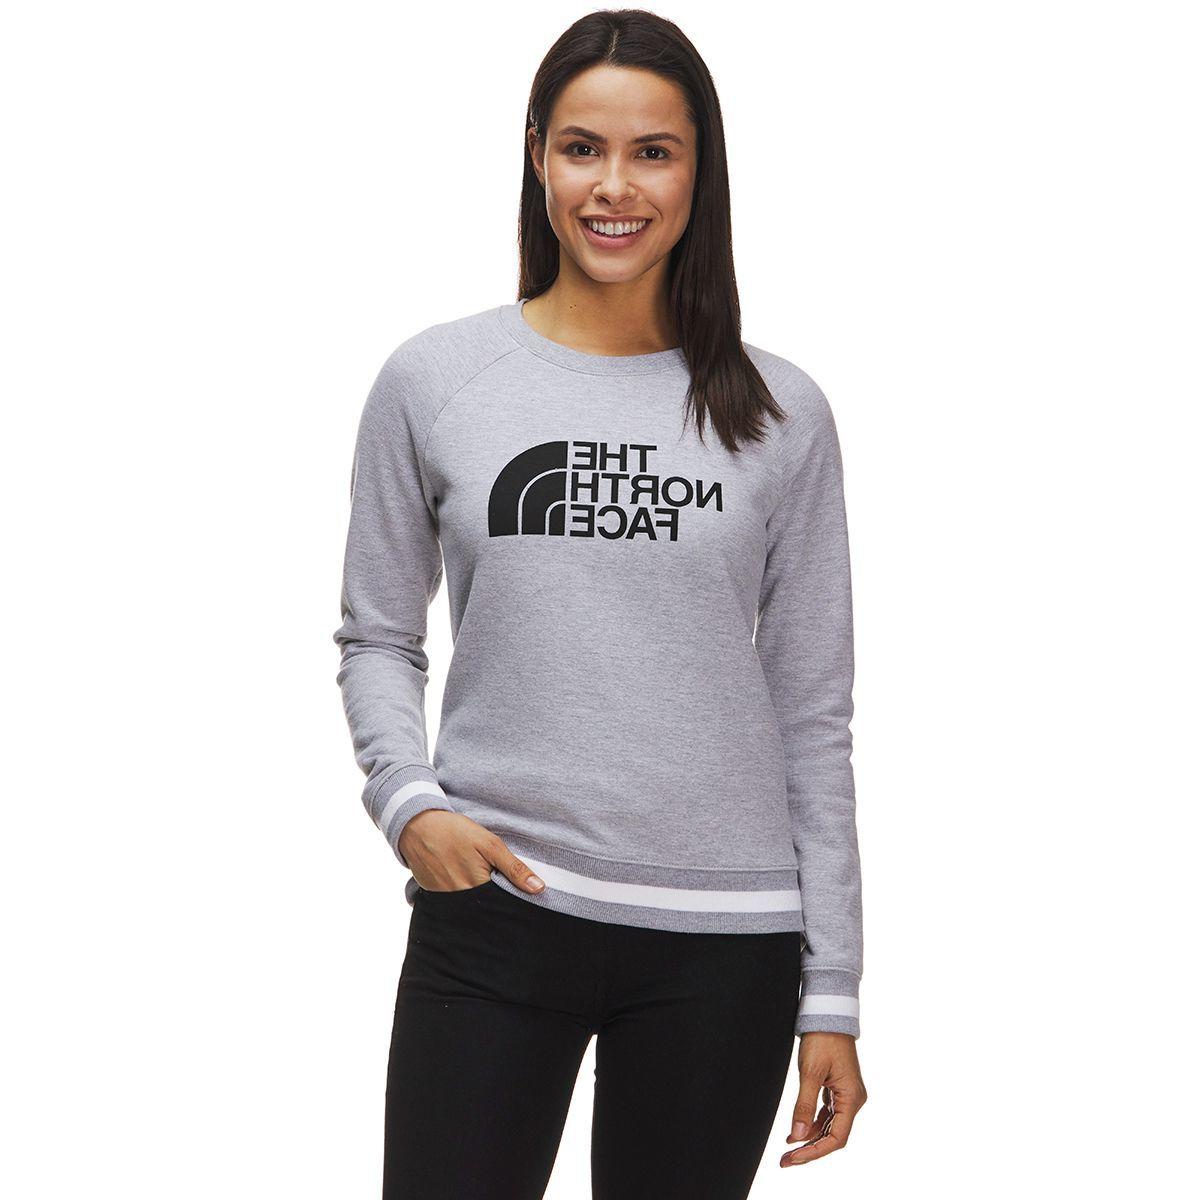 The North Face High Trail Crew Sweatshirt - Women's